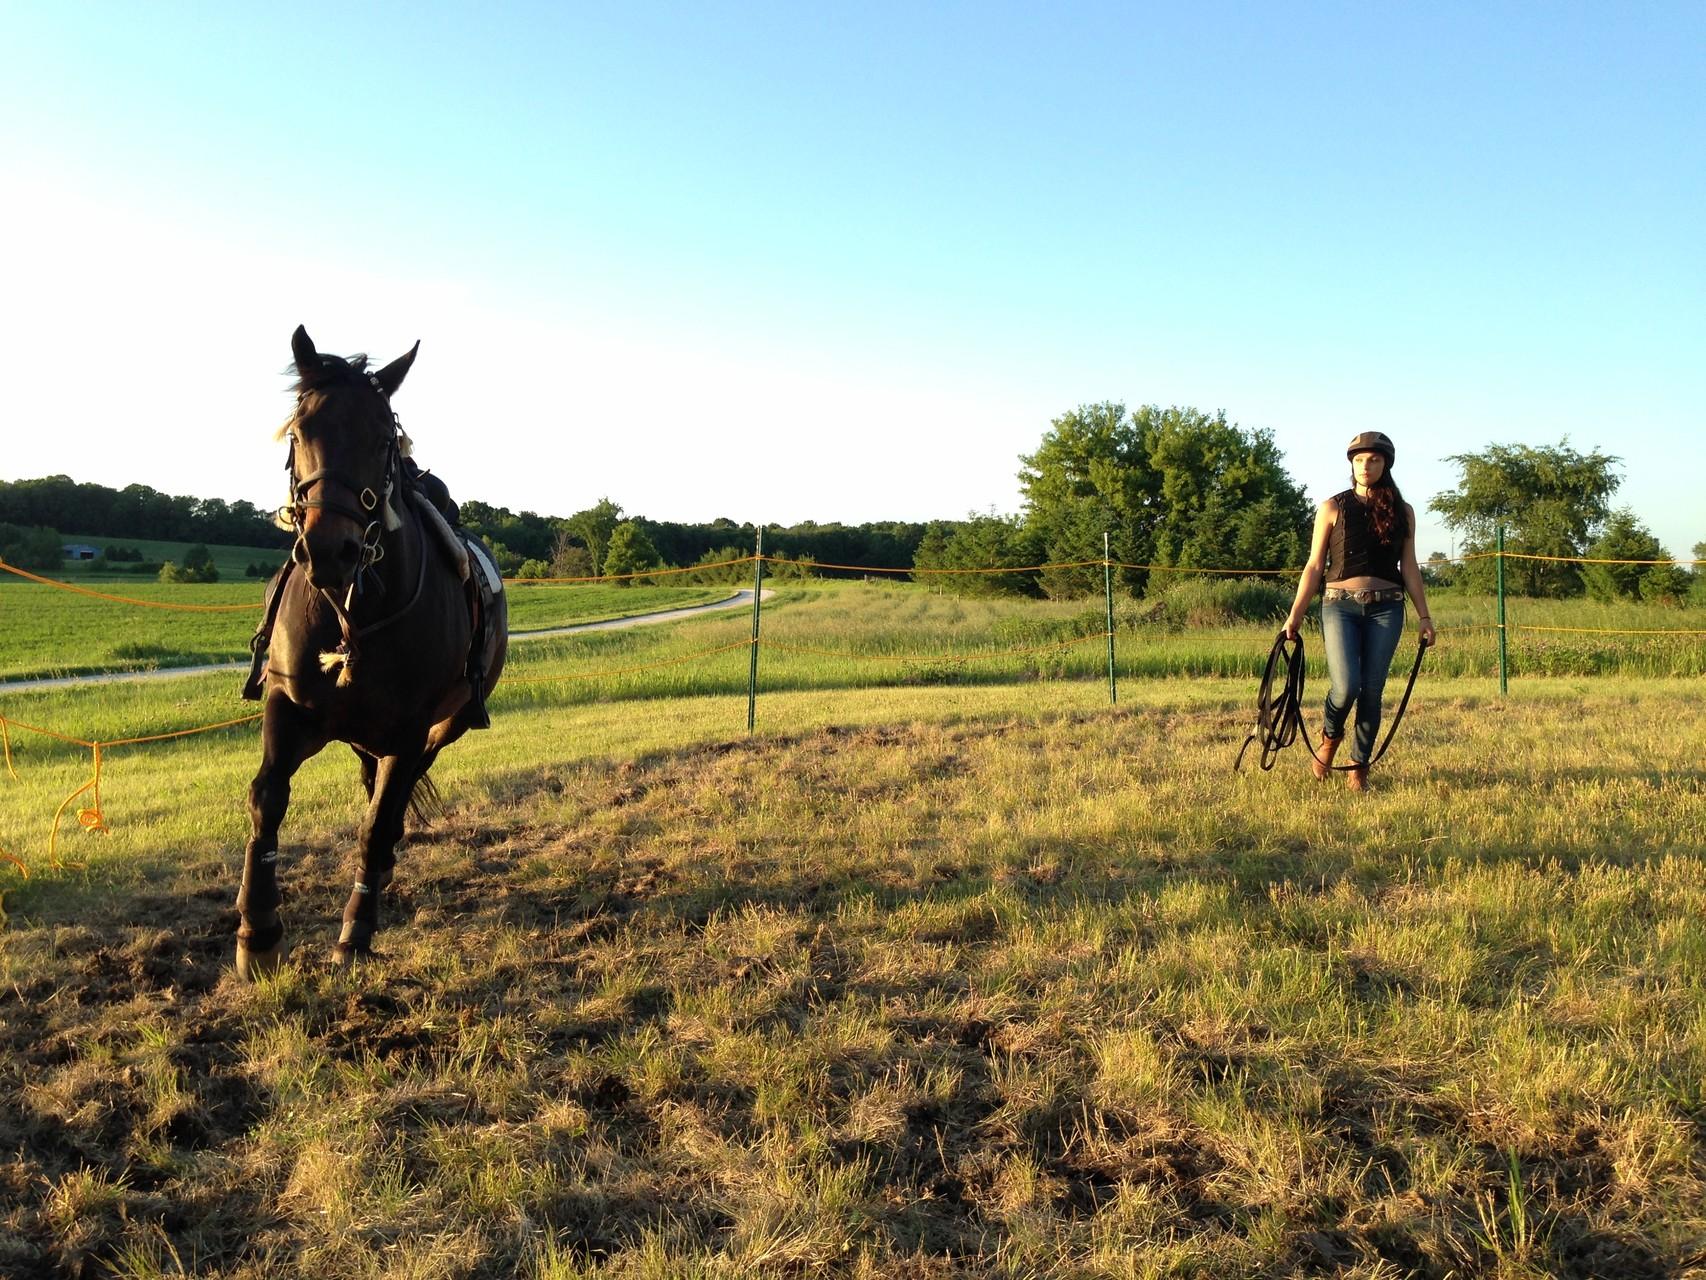 First saddle